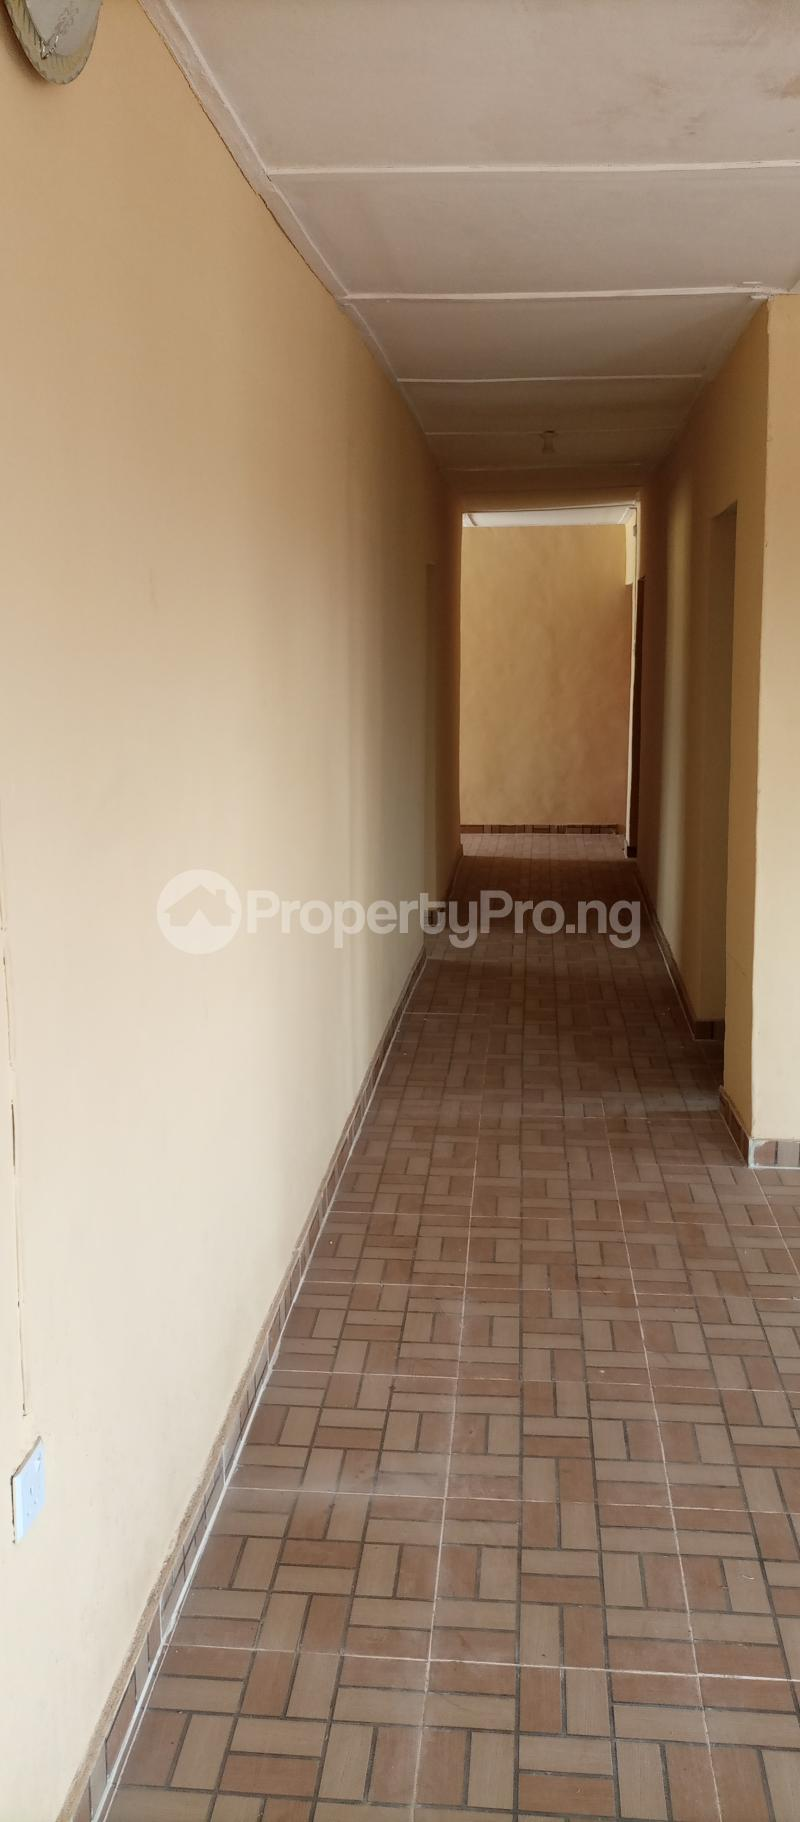 3 bedroom Flat / Apartment for rent Tekobo, Idi Aba Abeokuta Ogun State Idi Aba Abeokuta Ogun - 4